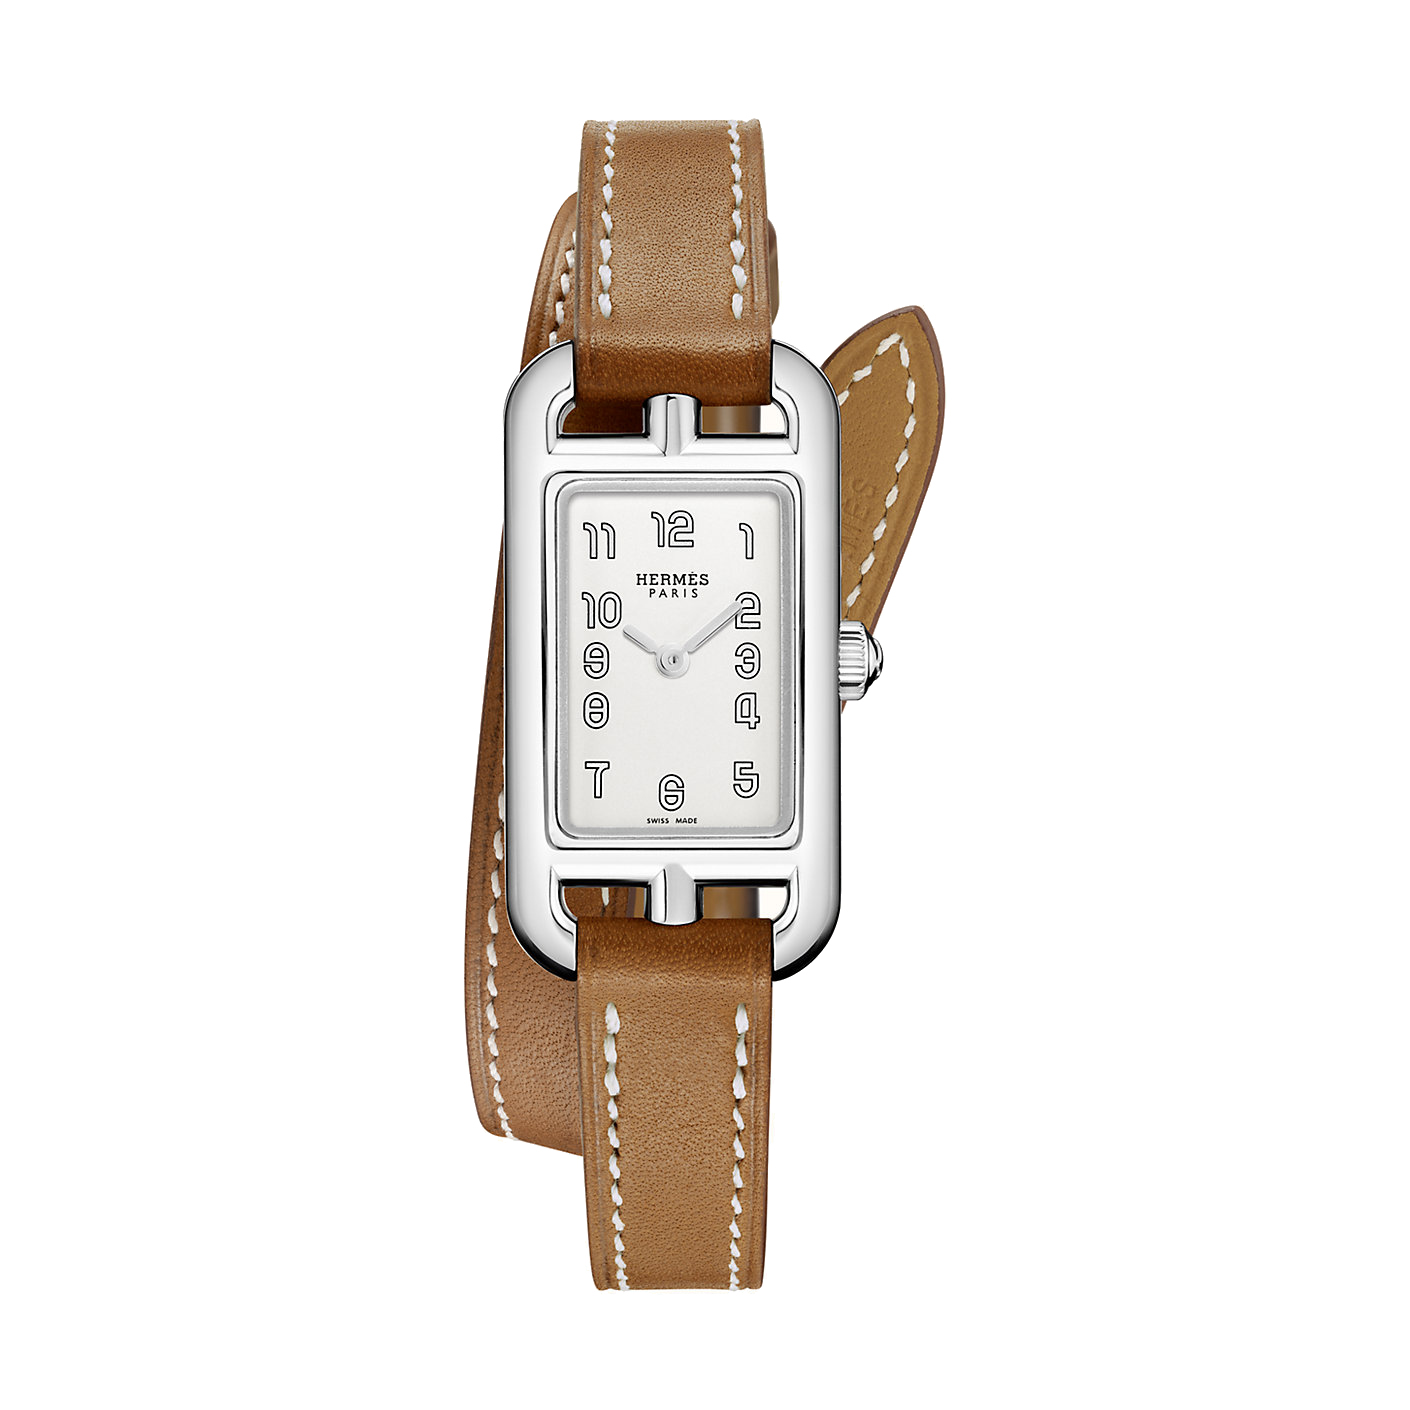 Hermès-nantucket-17-x-23mm-Hall-of-Time-044325WW00